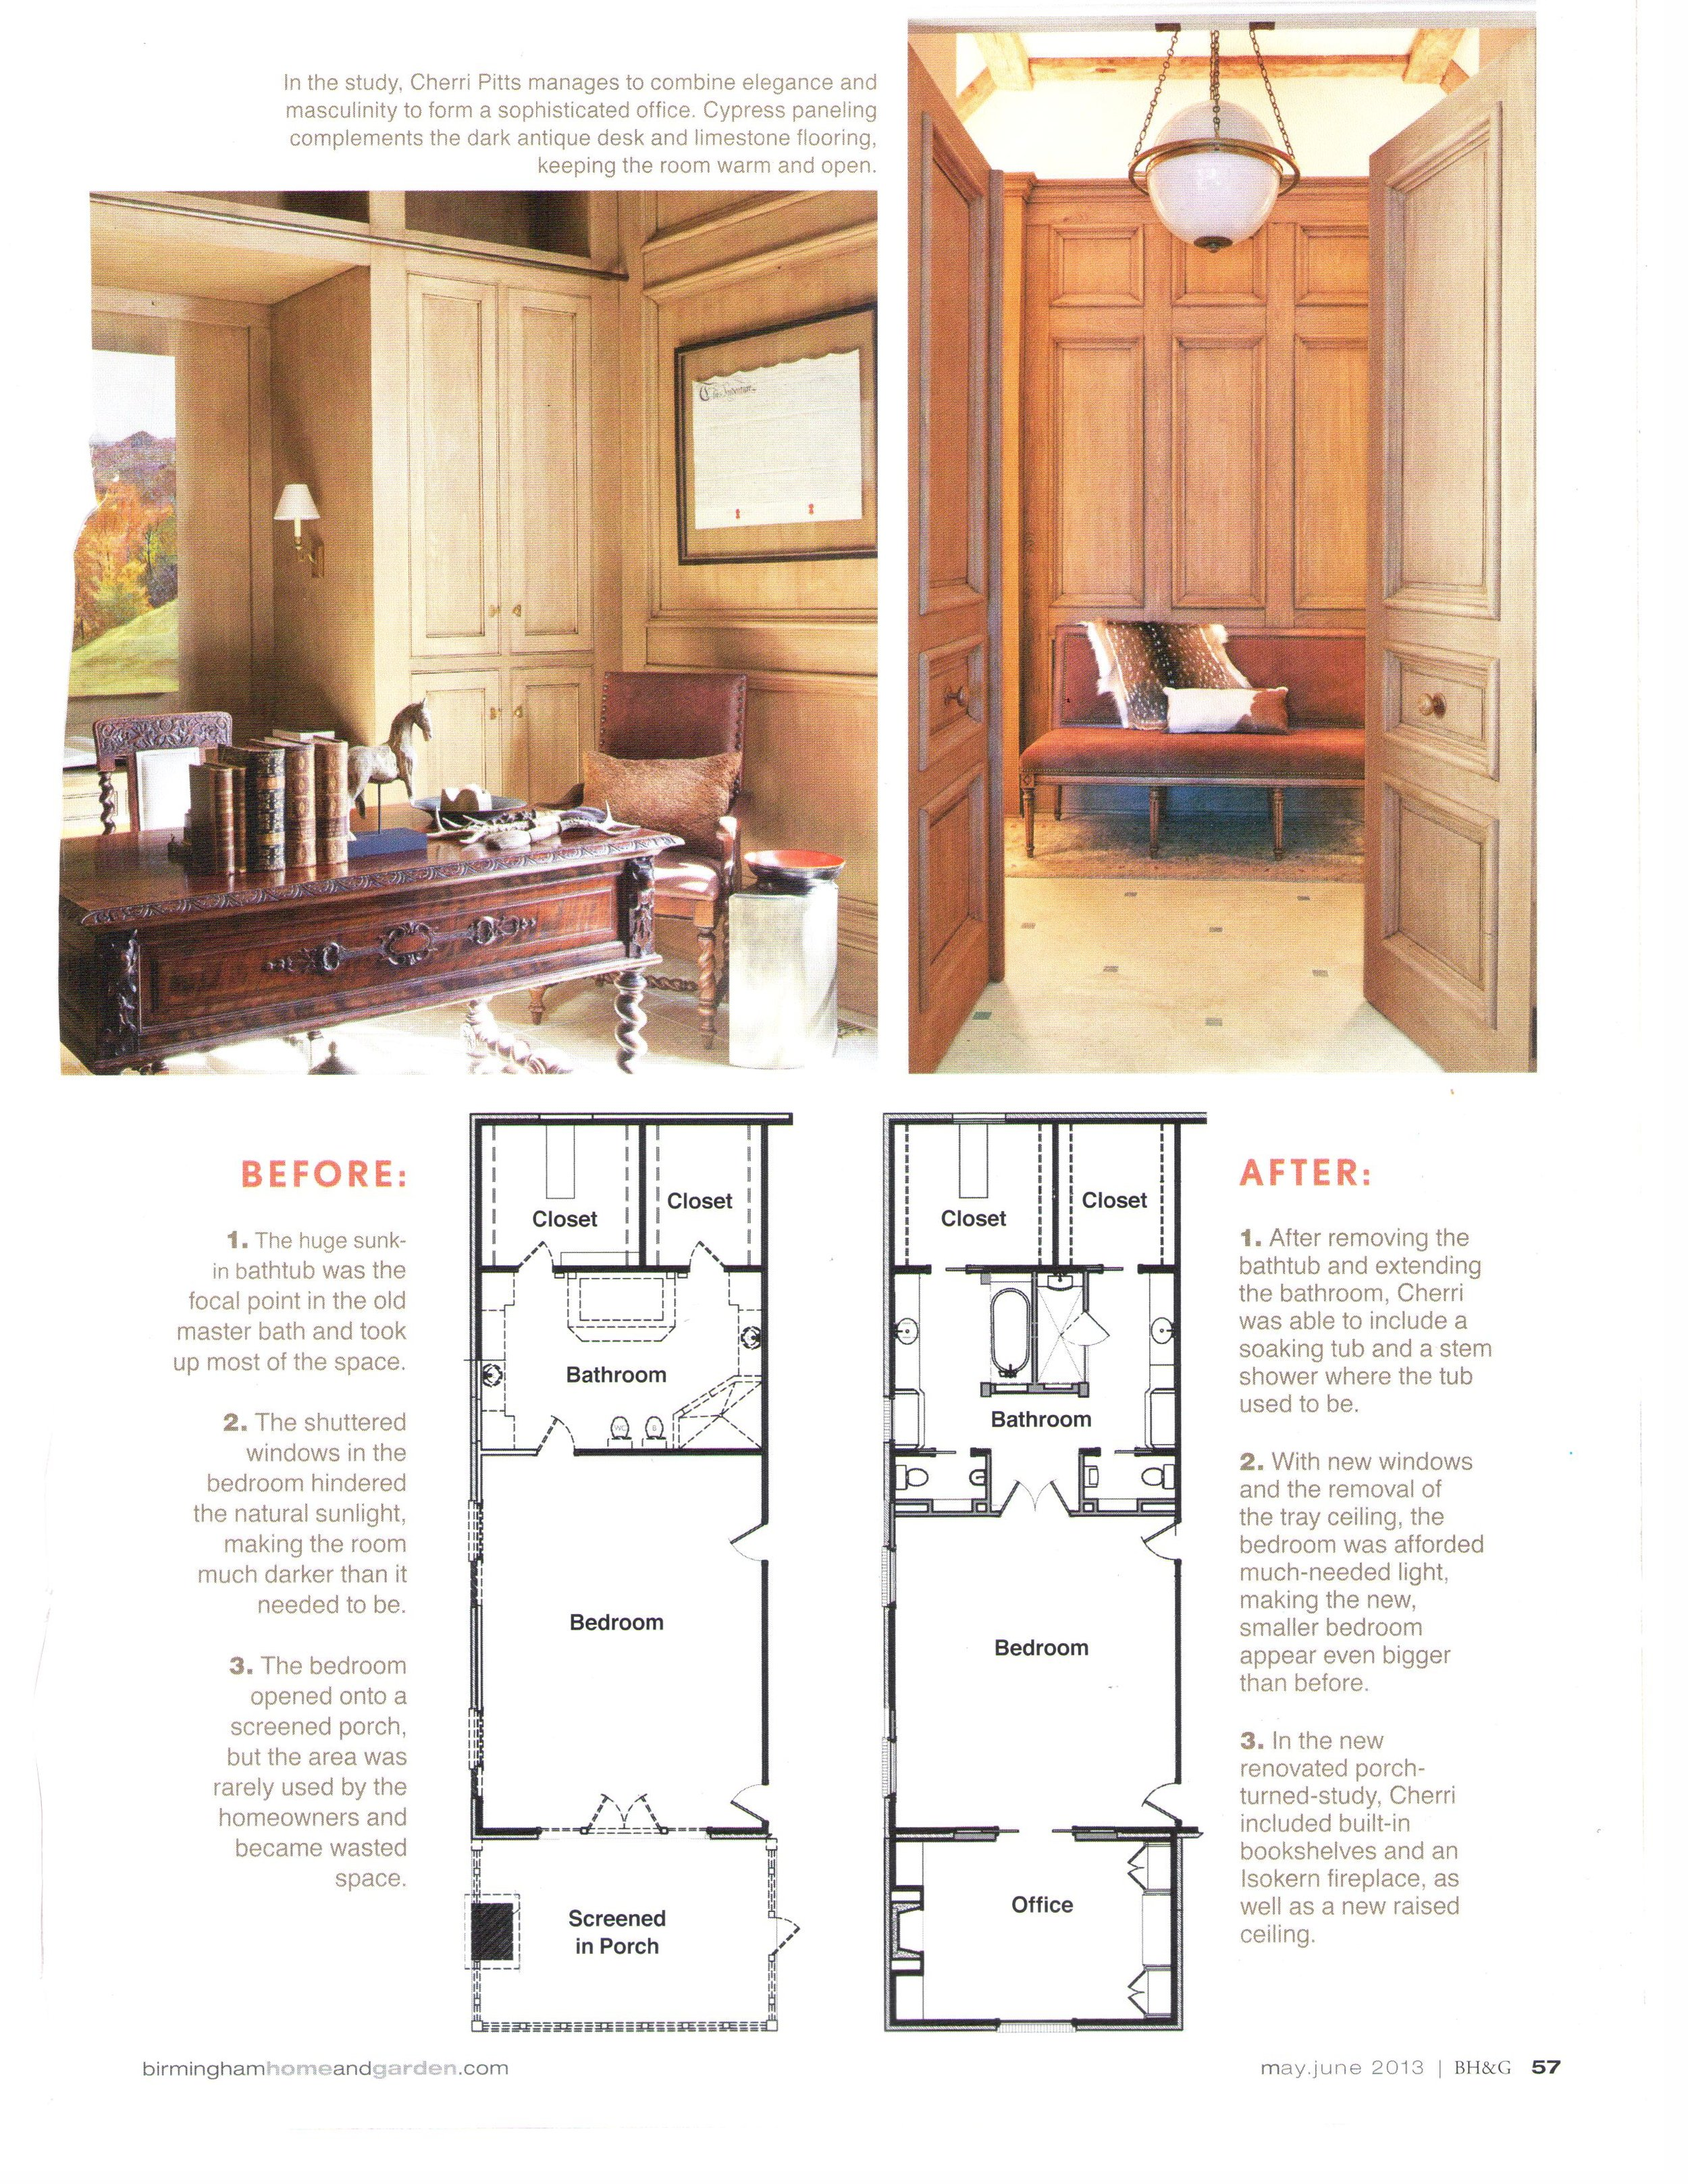 B'Ham Home & Garden Suite Upgrade magazine page 4 architecture exterior and interior design Alabama